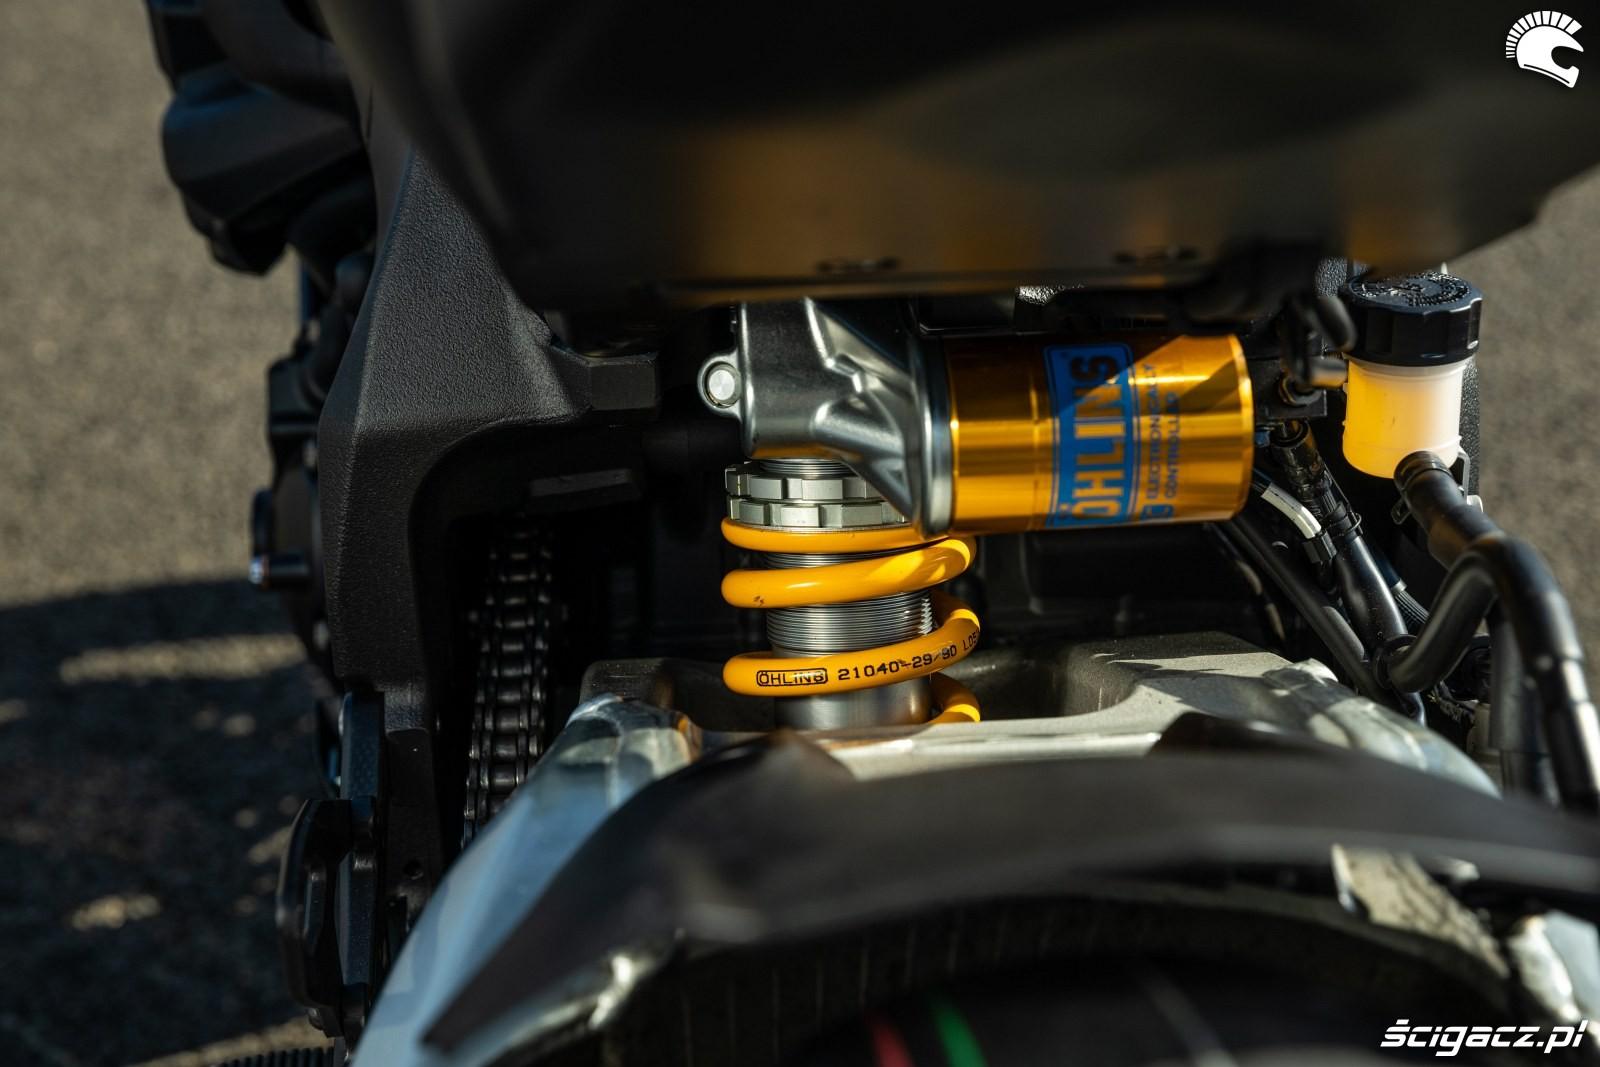 Yamaha R1 M 2020 zawias